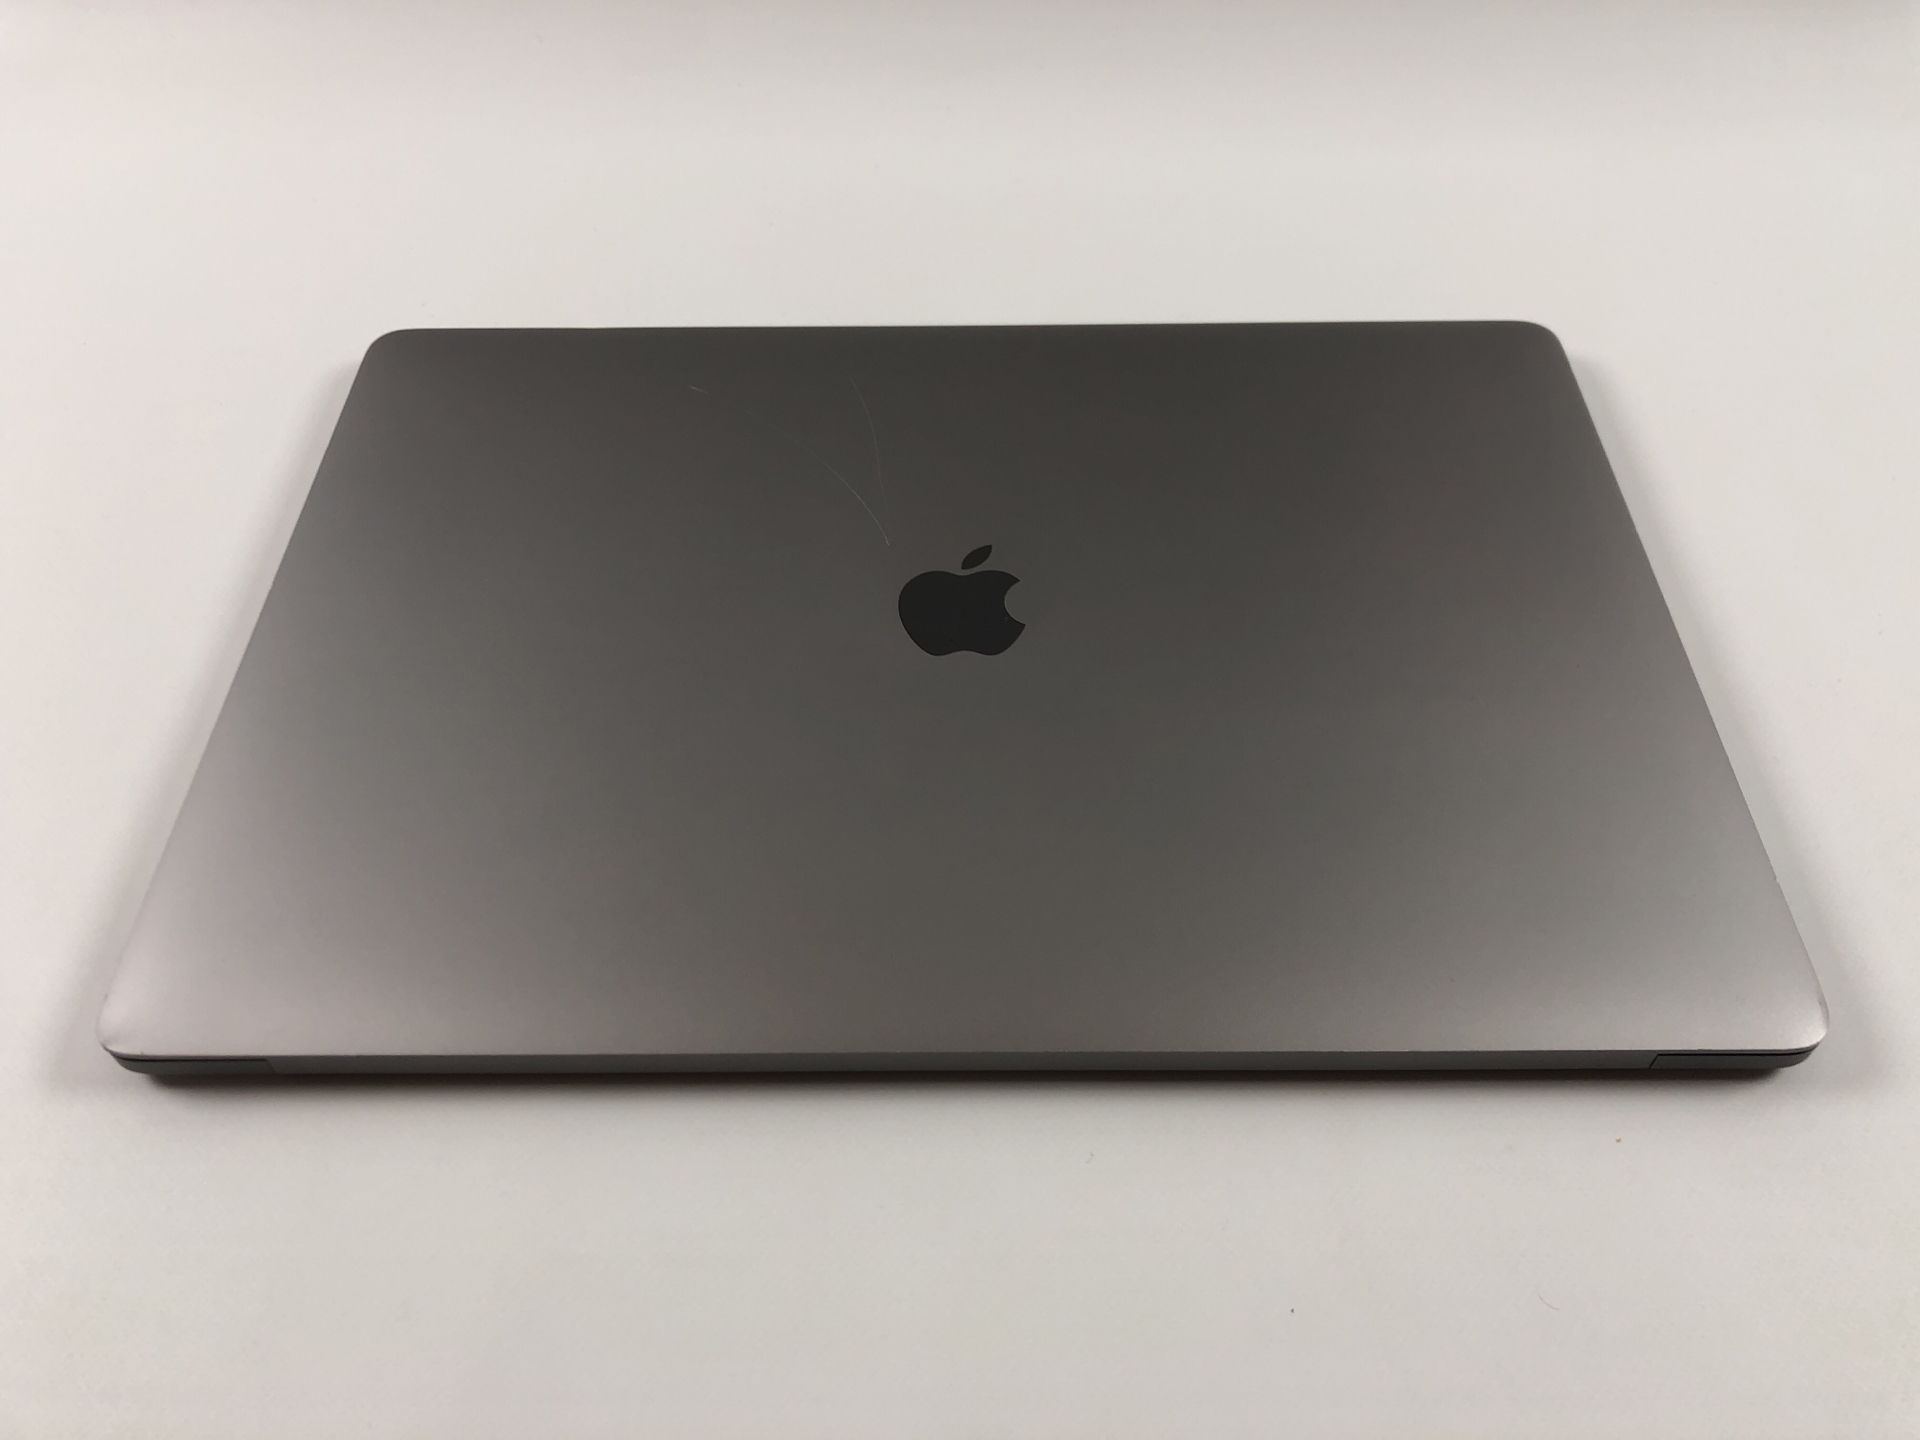 "MacBook Pro 15"" Touch Bar Late 2016 (Intel Quad-Core i7 2.7 GHz 16 GB RAM 512 GB SSD), Space Gray, Intel Quad-Core i7 2.7 GHz, 16 GB RAM, 512 GB SSD, Afbeelding 2"